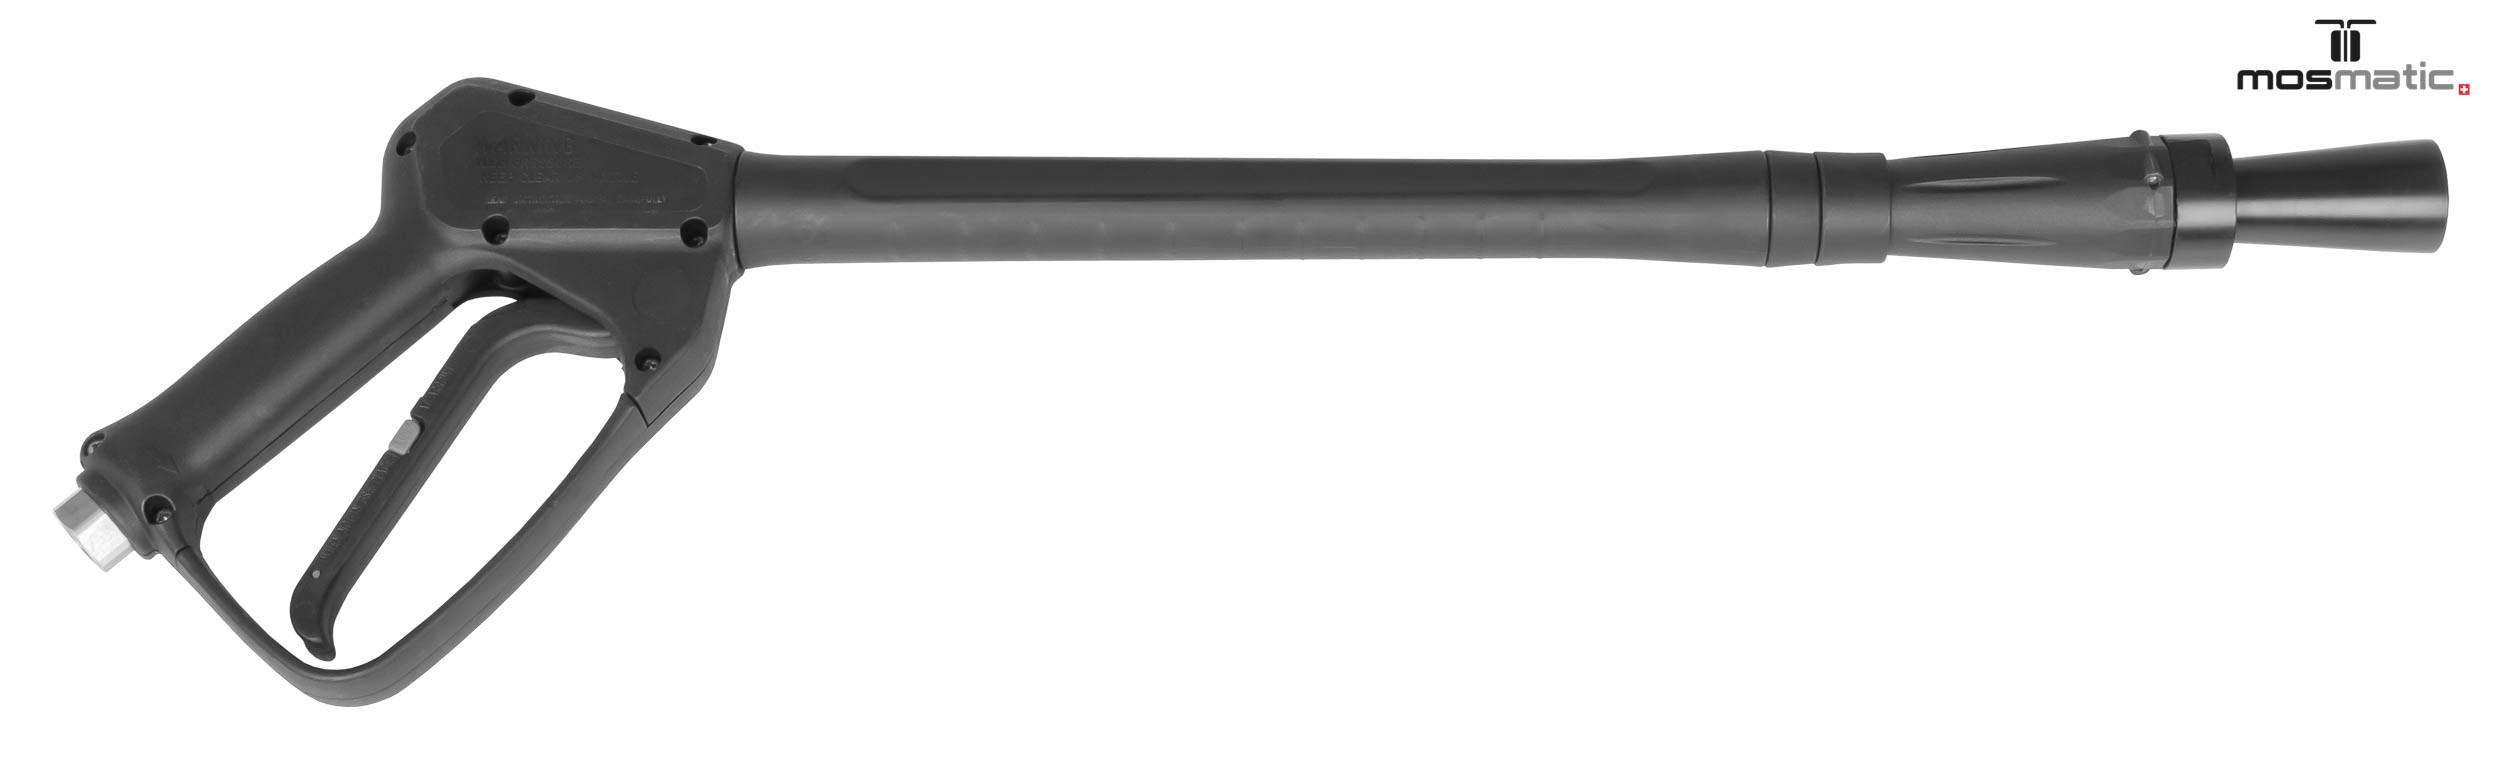 Black weeping foam gun 700mm F 3/8 Mosmatic